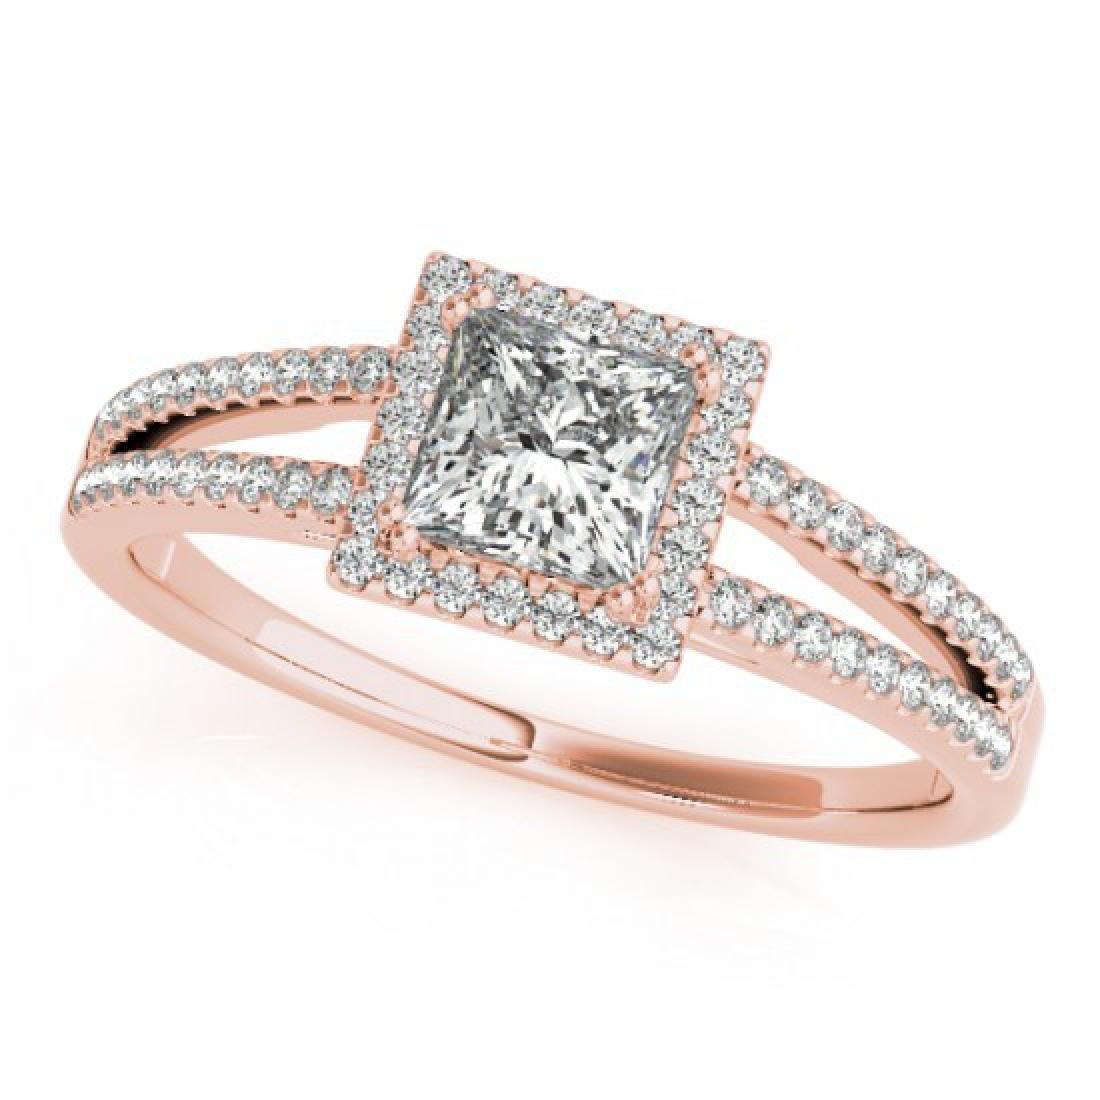 1.4 CTW Certified VS/SI Princess Diamond Solitaire Halo